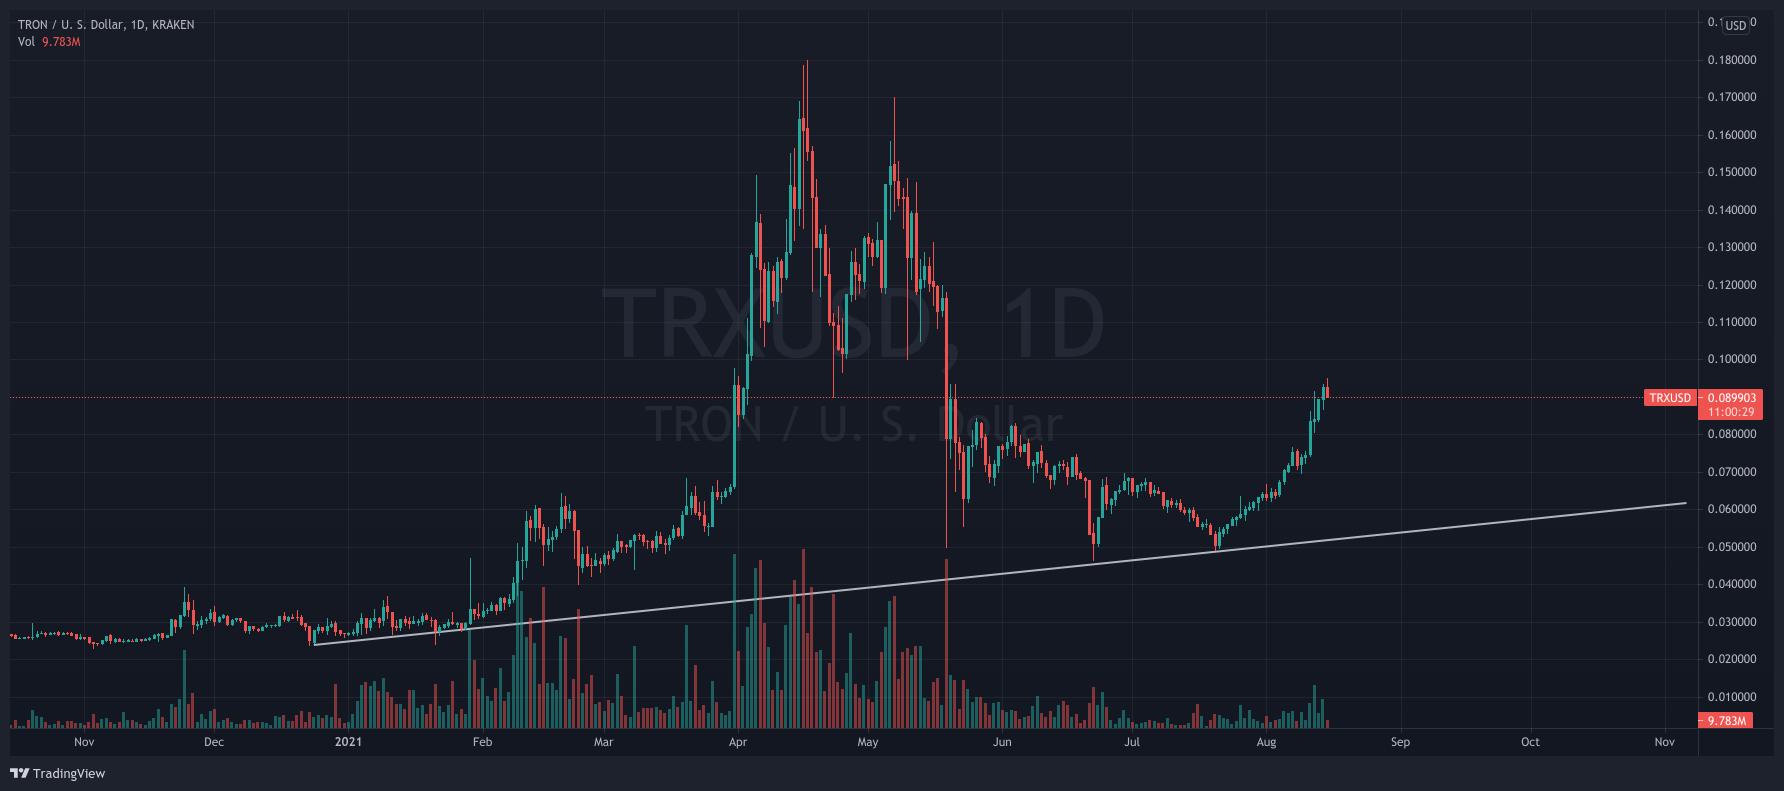 Buy Tron - TRX/USD 1-day chart showing TRX's uptrend